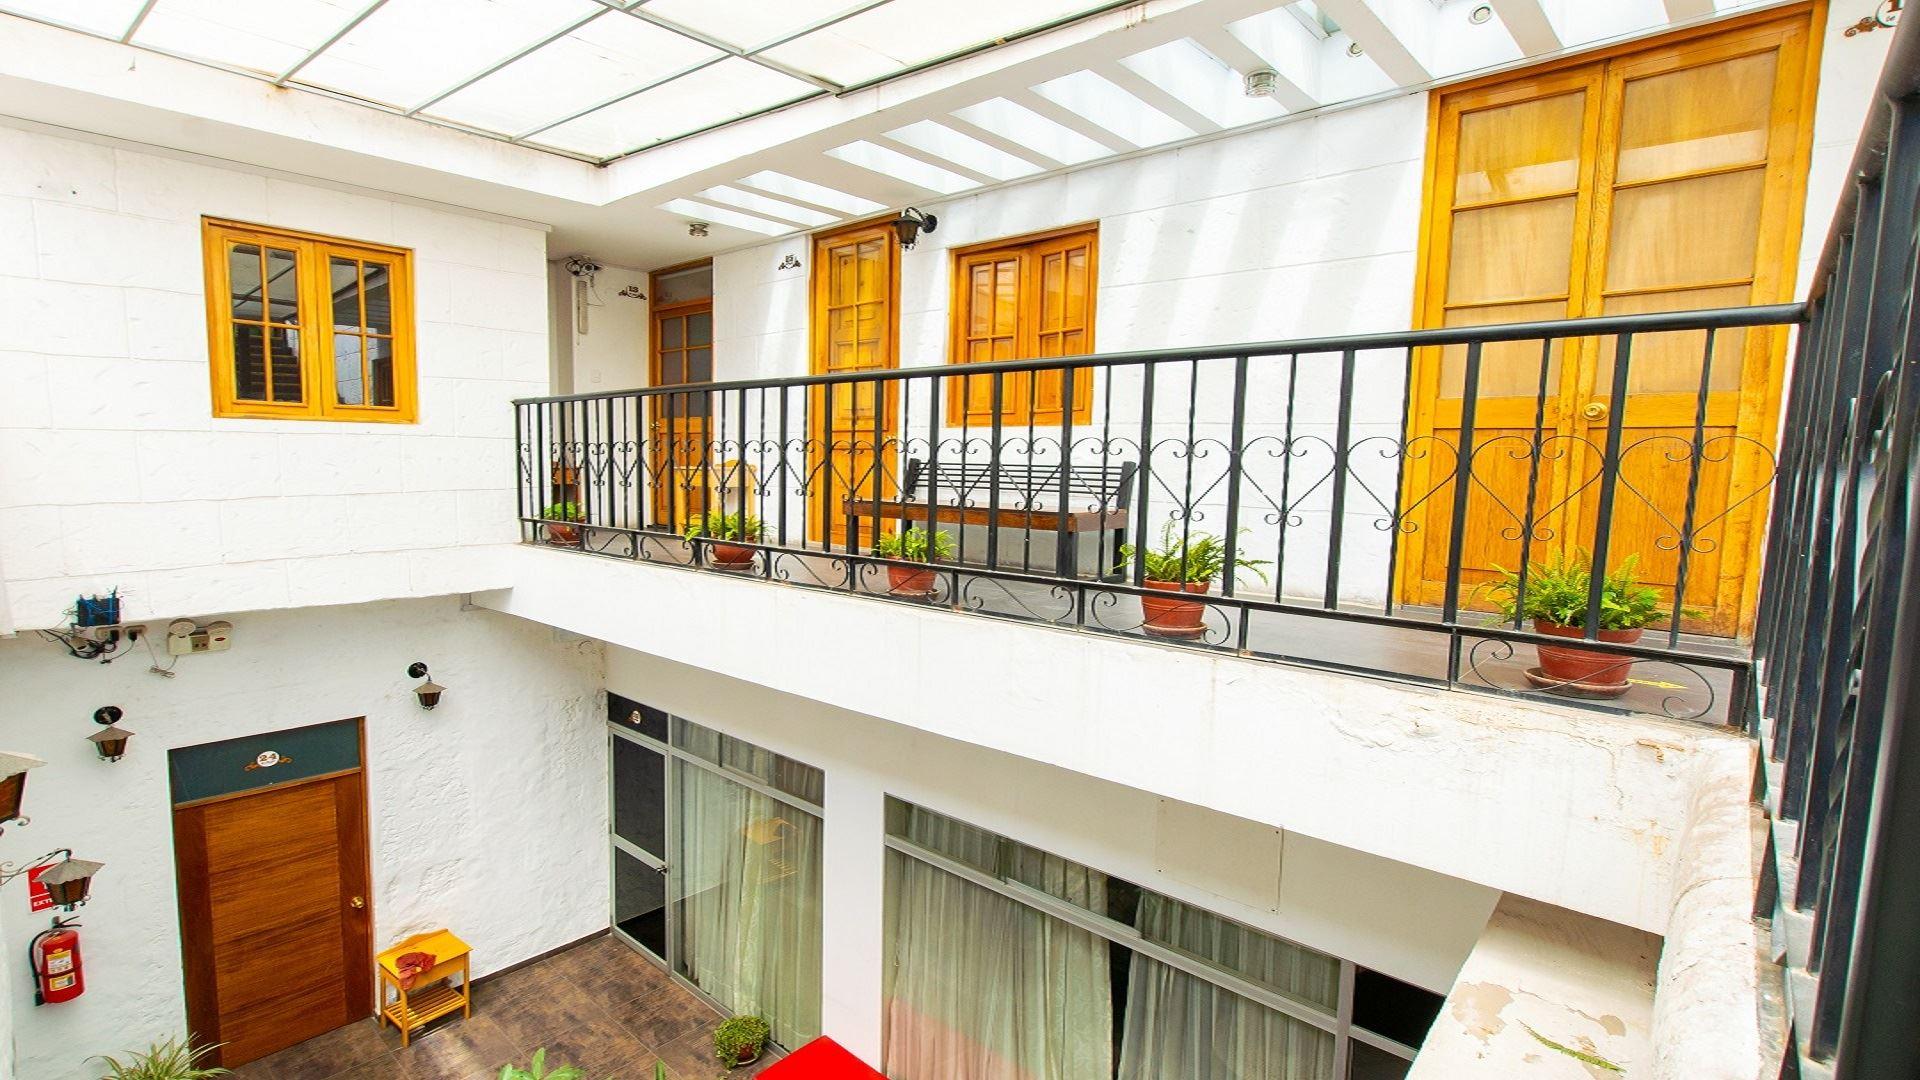 Le Foyer Arequipa